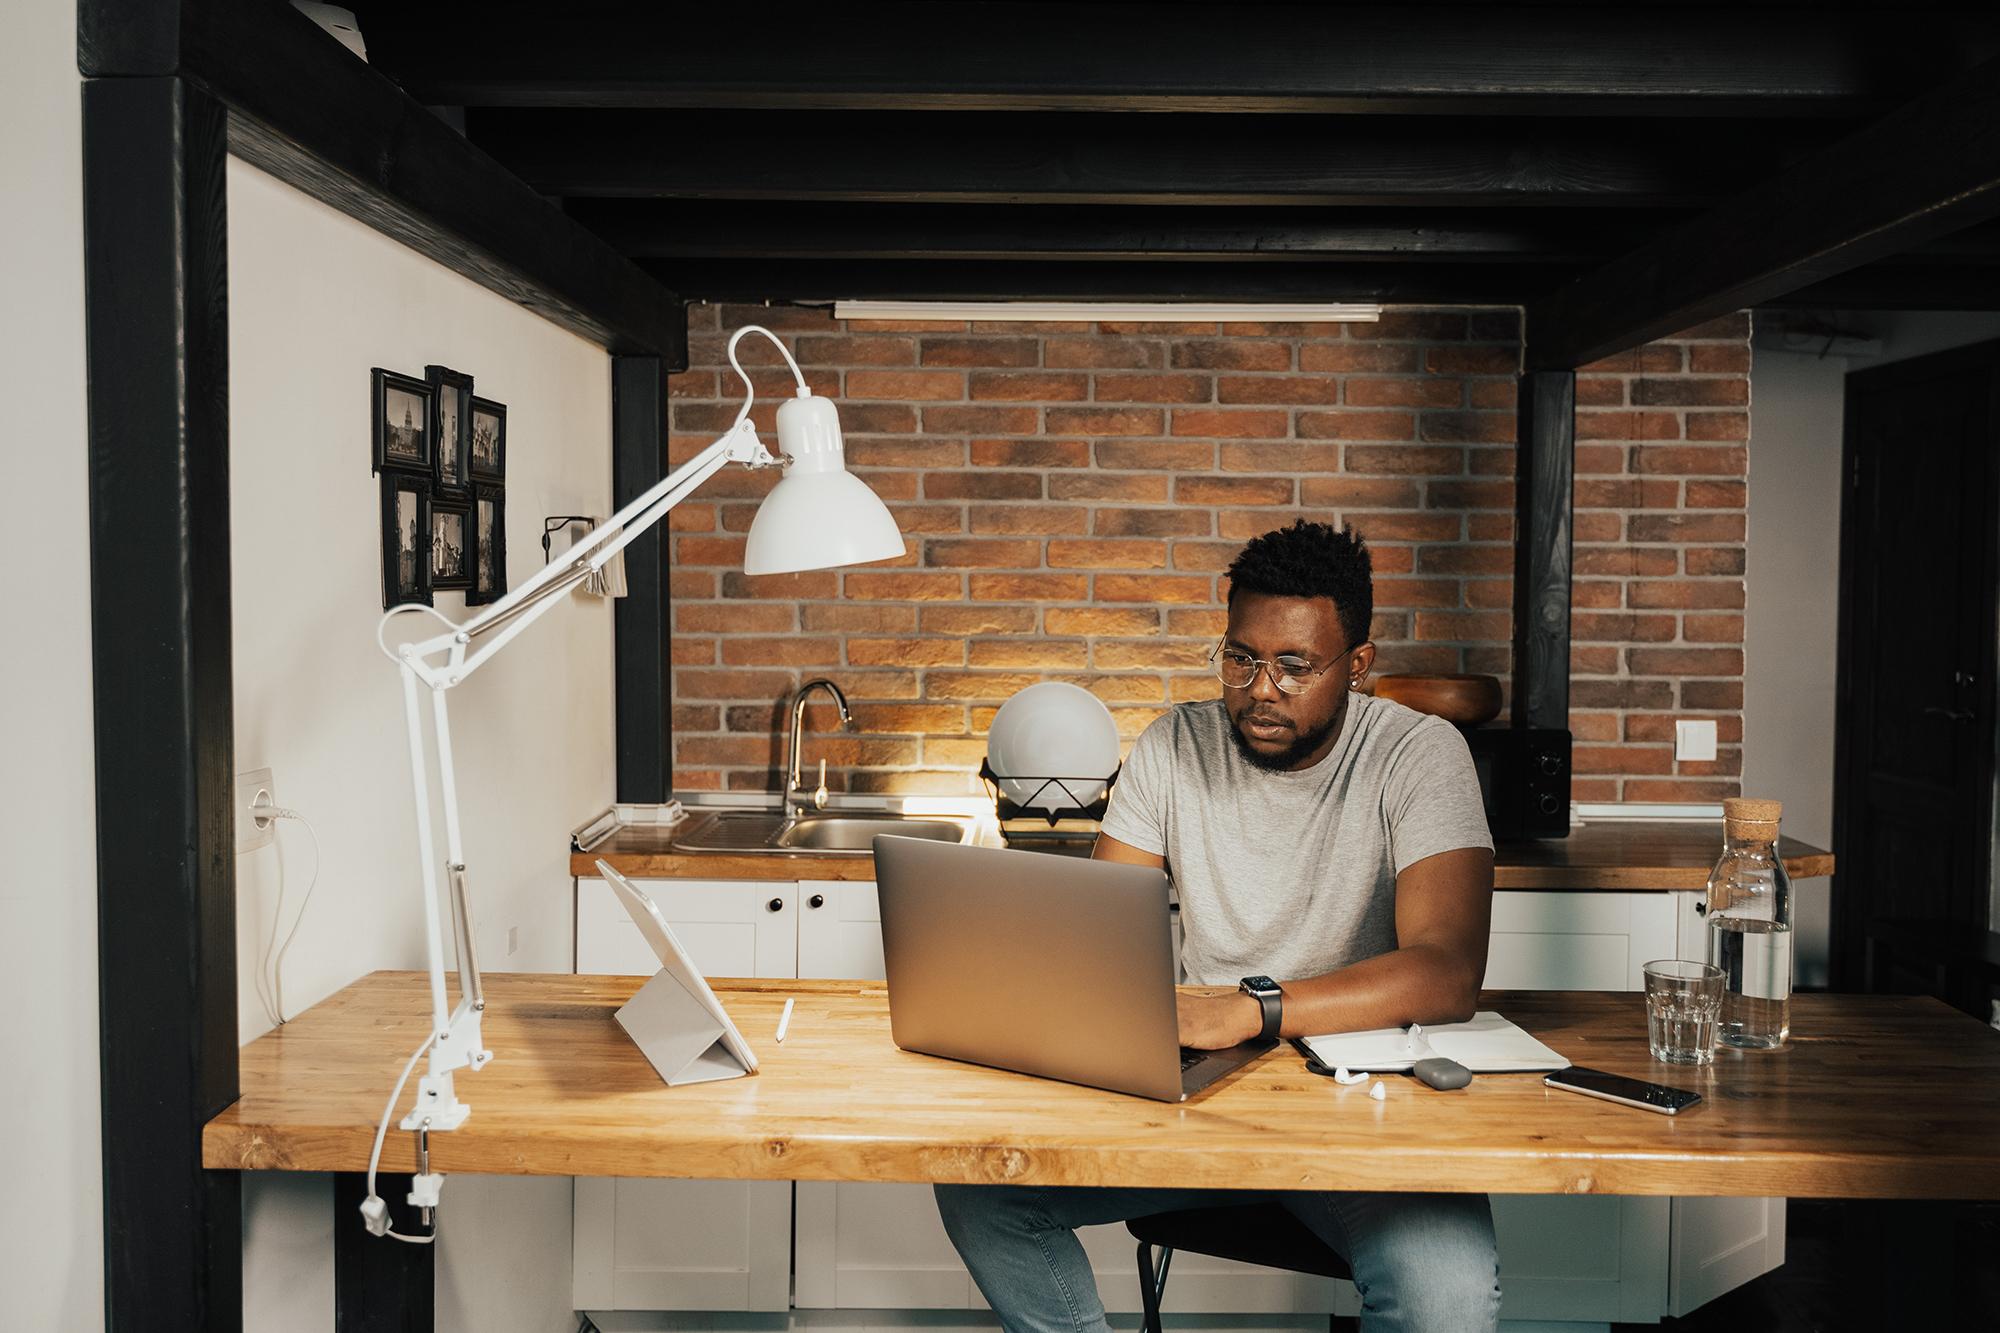 Working from home – advice from an ergonomics expert